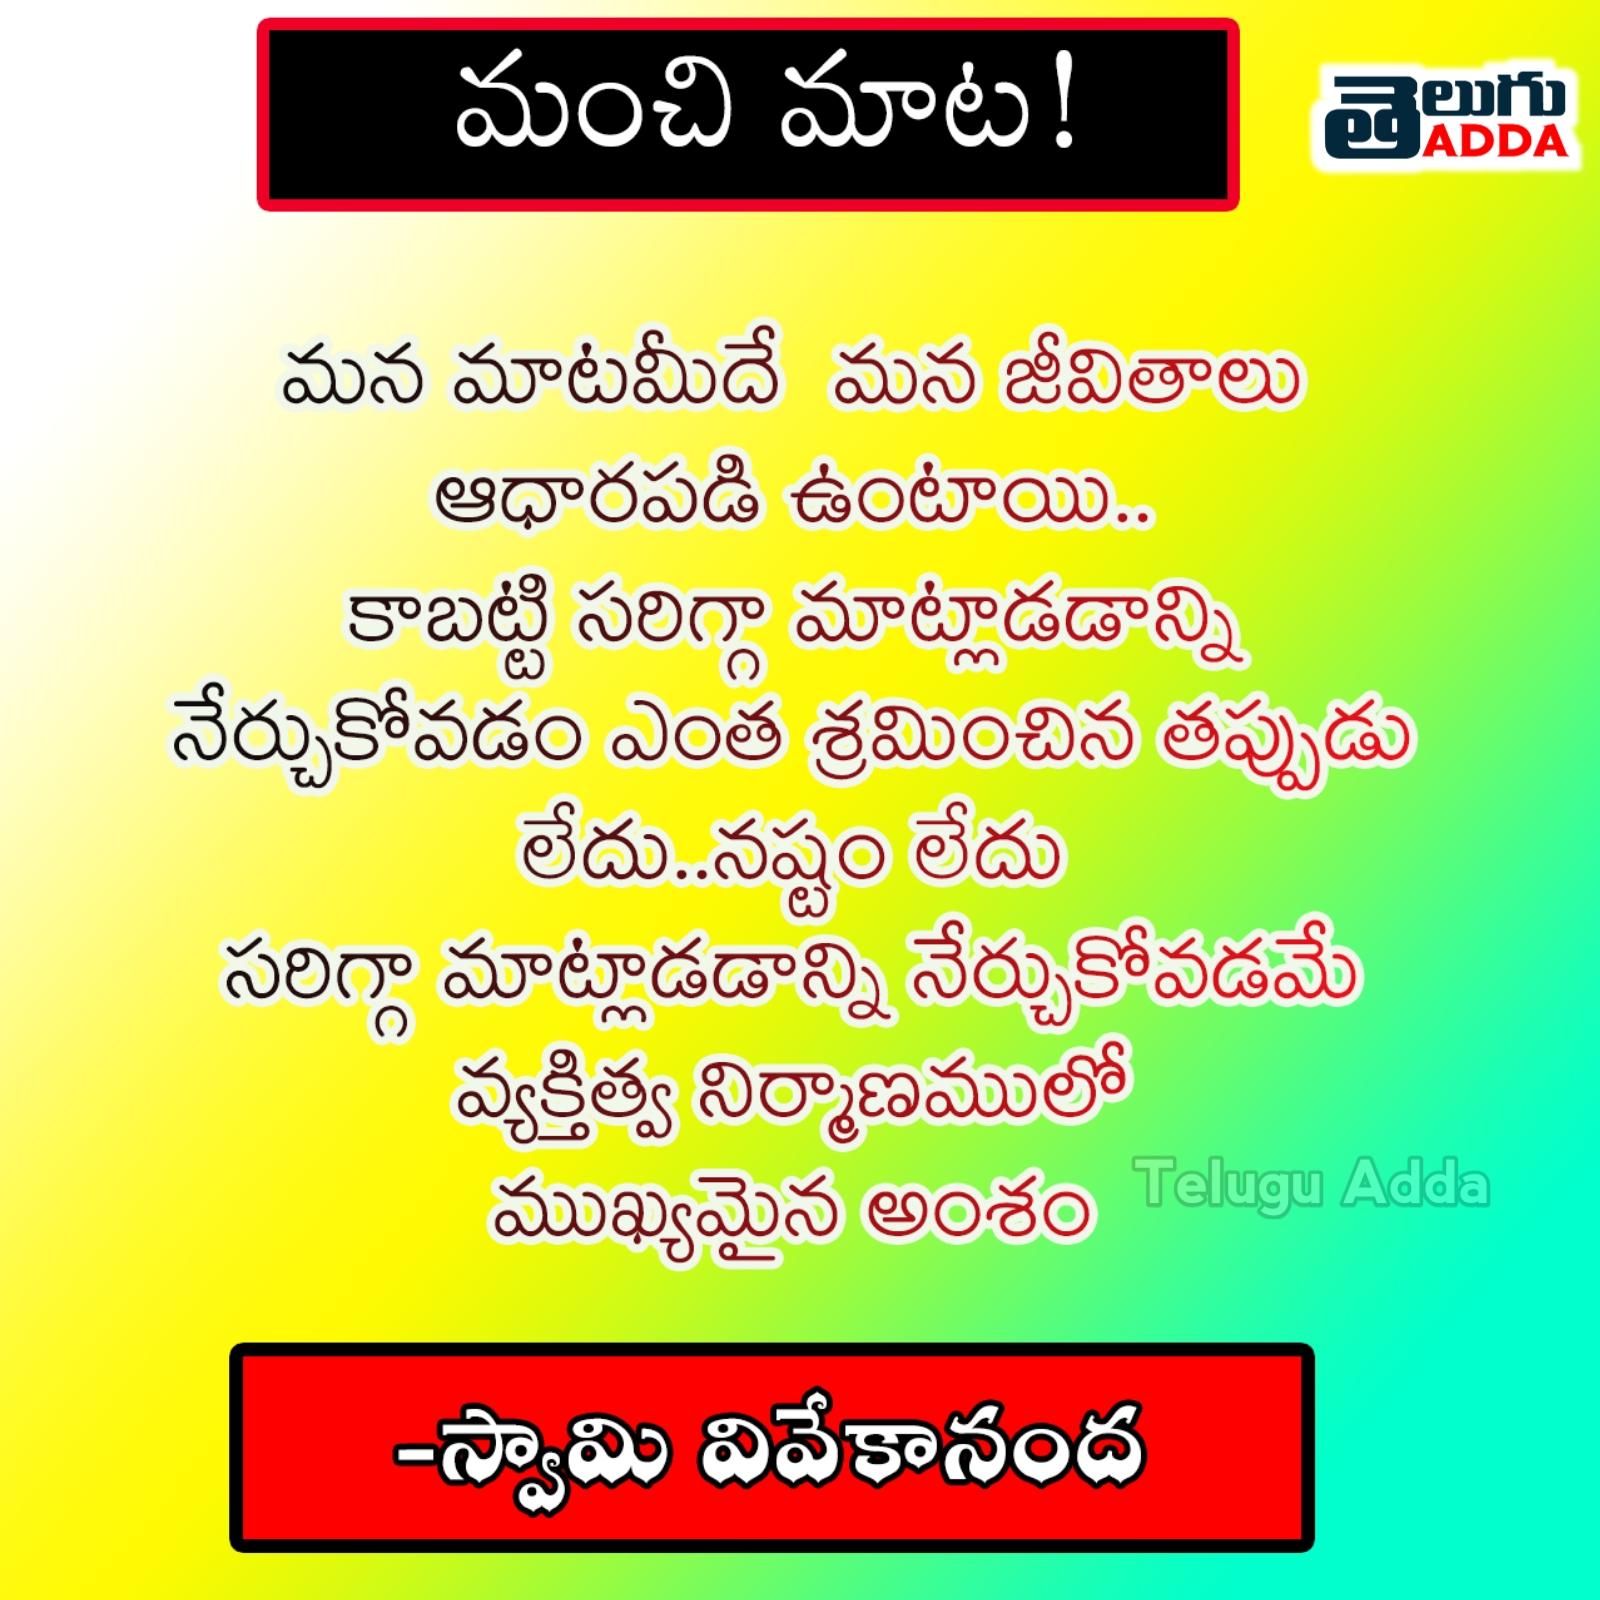 Telugu Whatsapp Quotes 2020